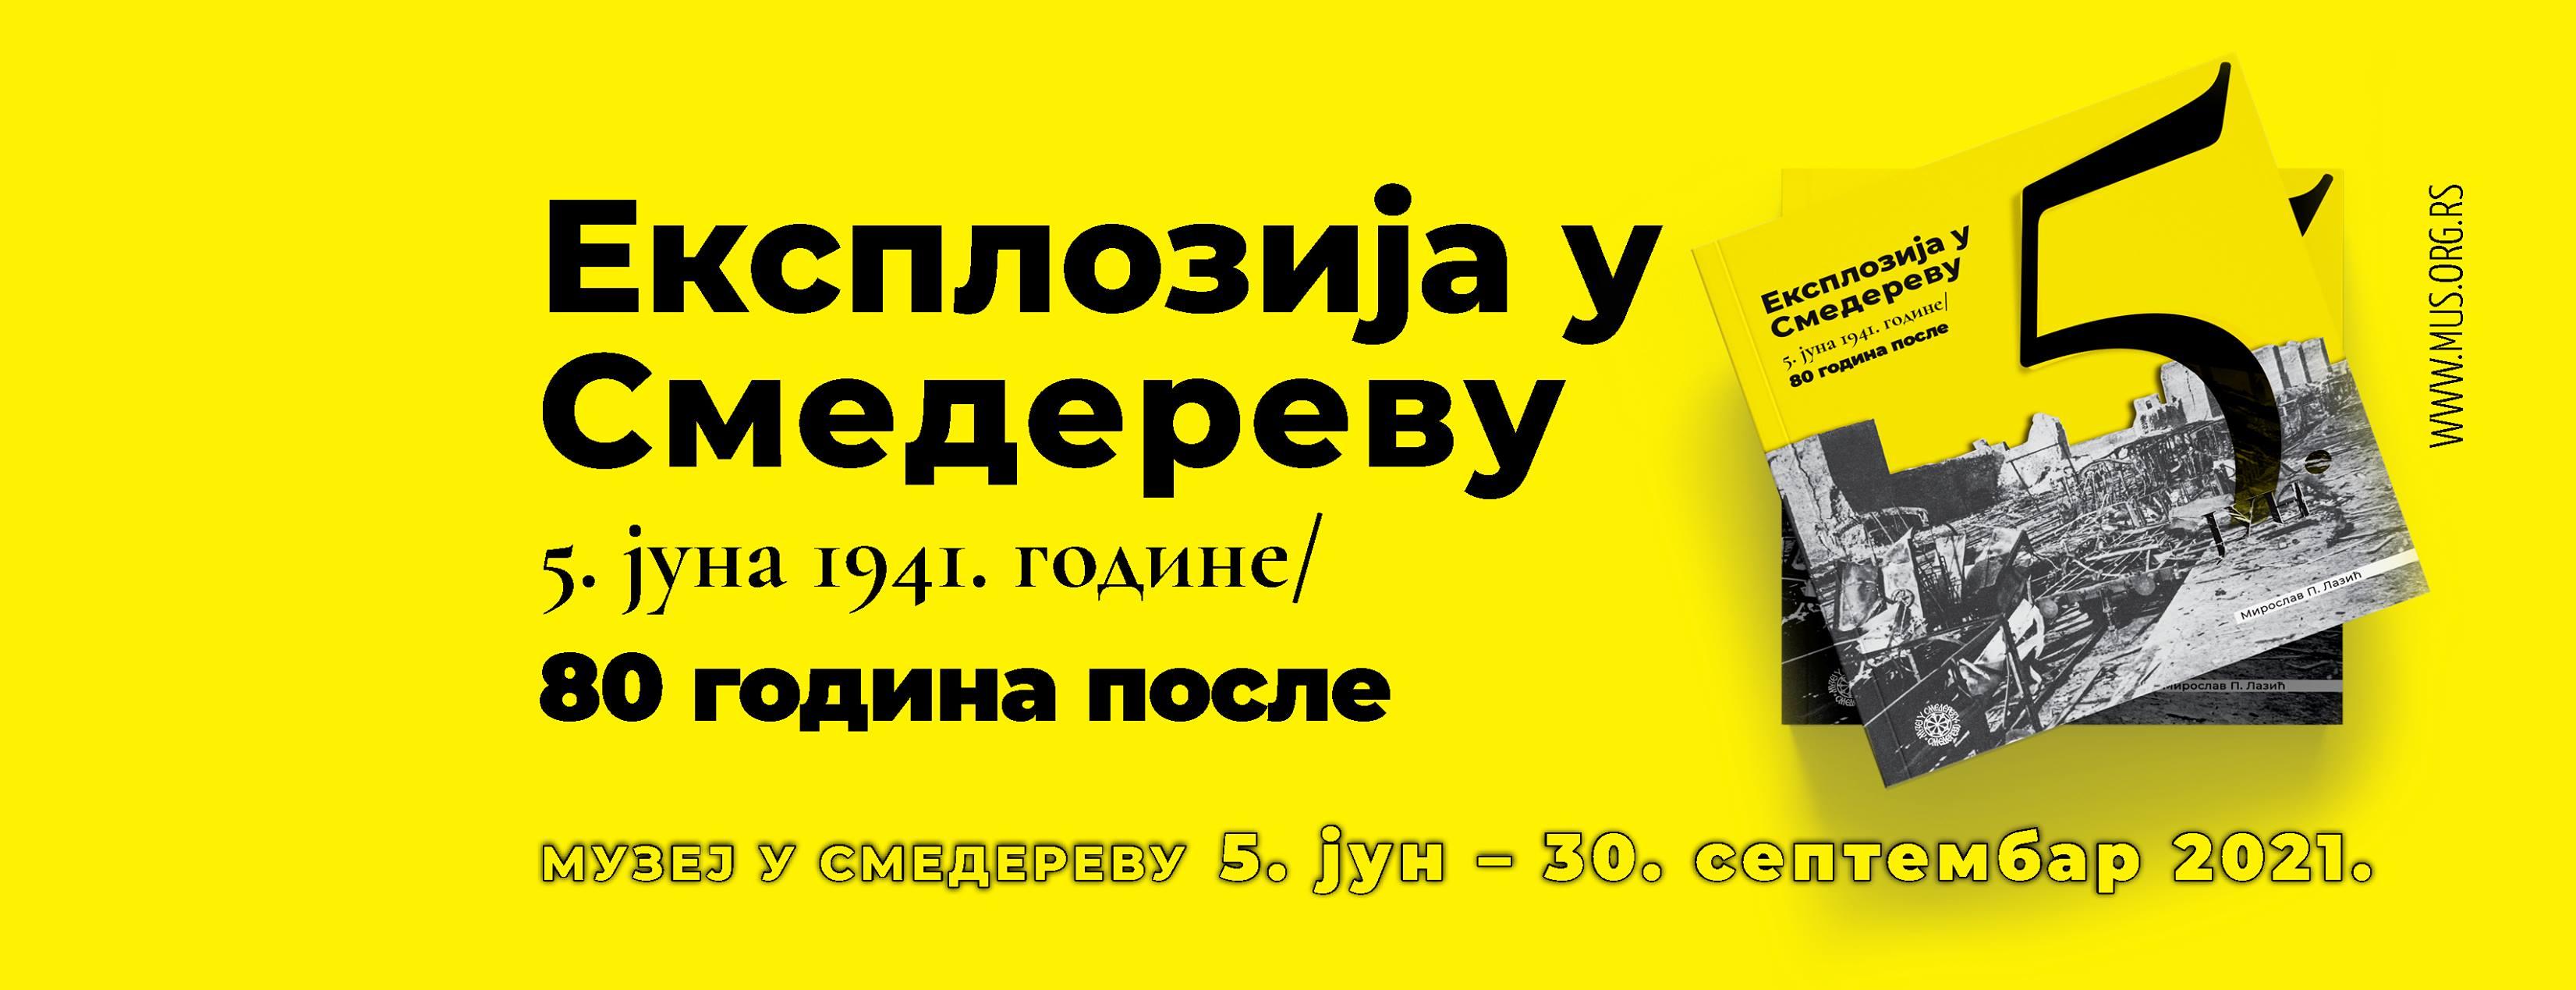 plakat-izlozba-eksplozija-u-smederevu-2021-smederevo